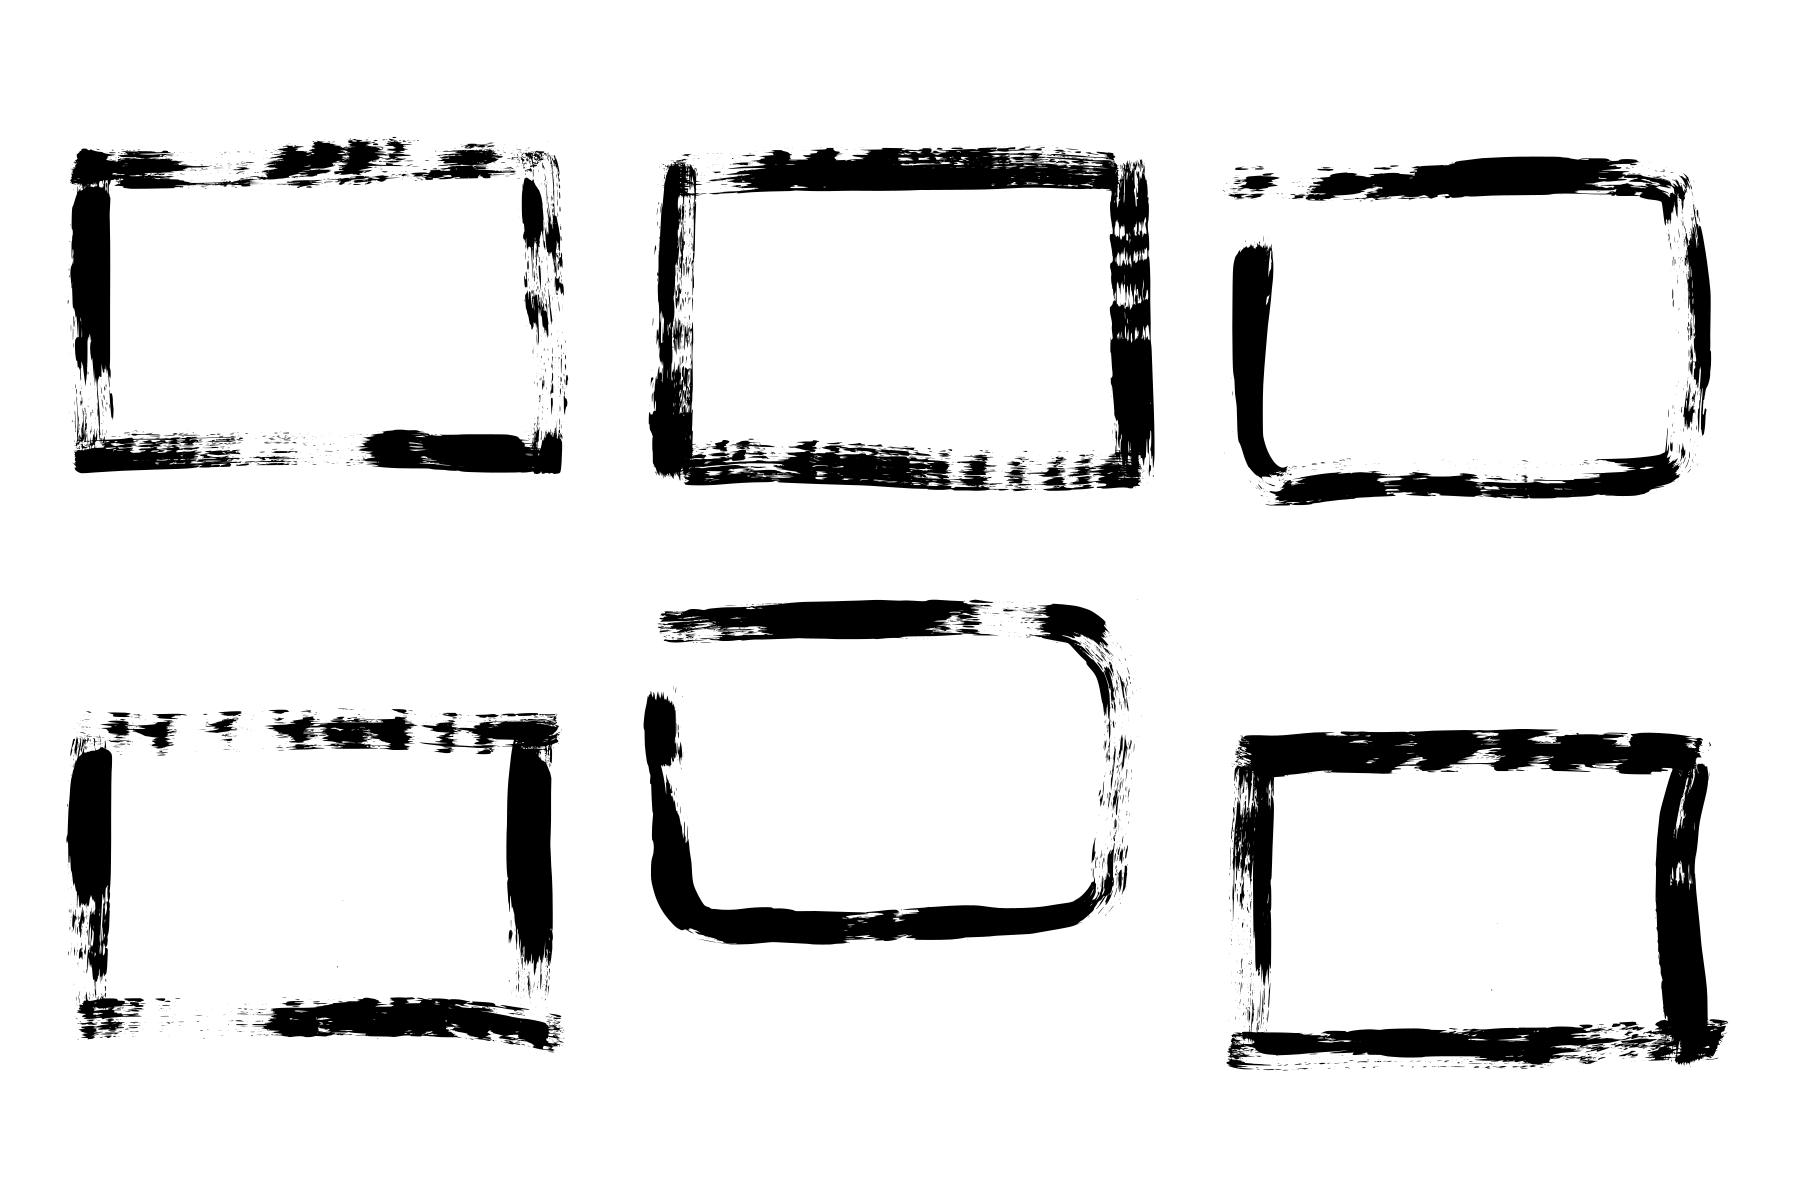 6-grunge-brush-stroke-rectangle-frame-cover.png